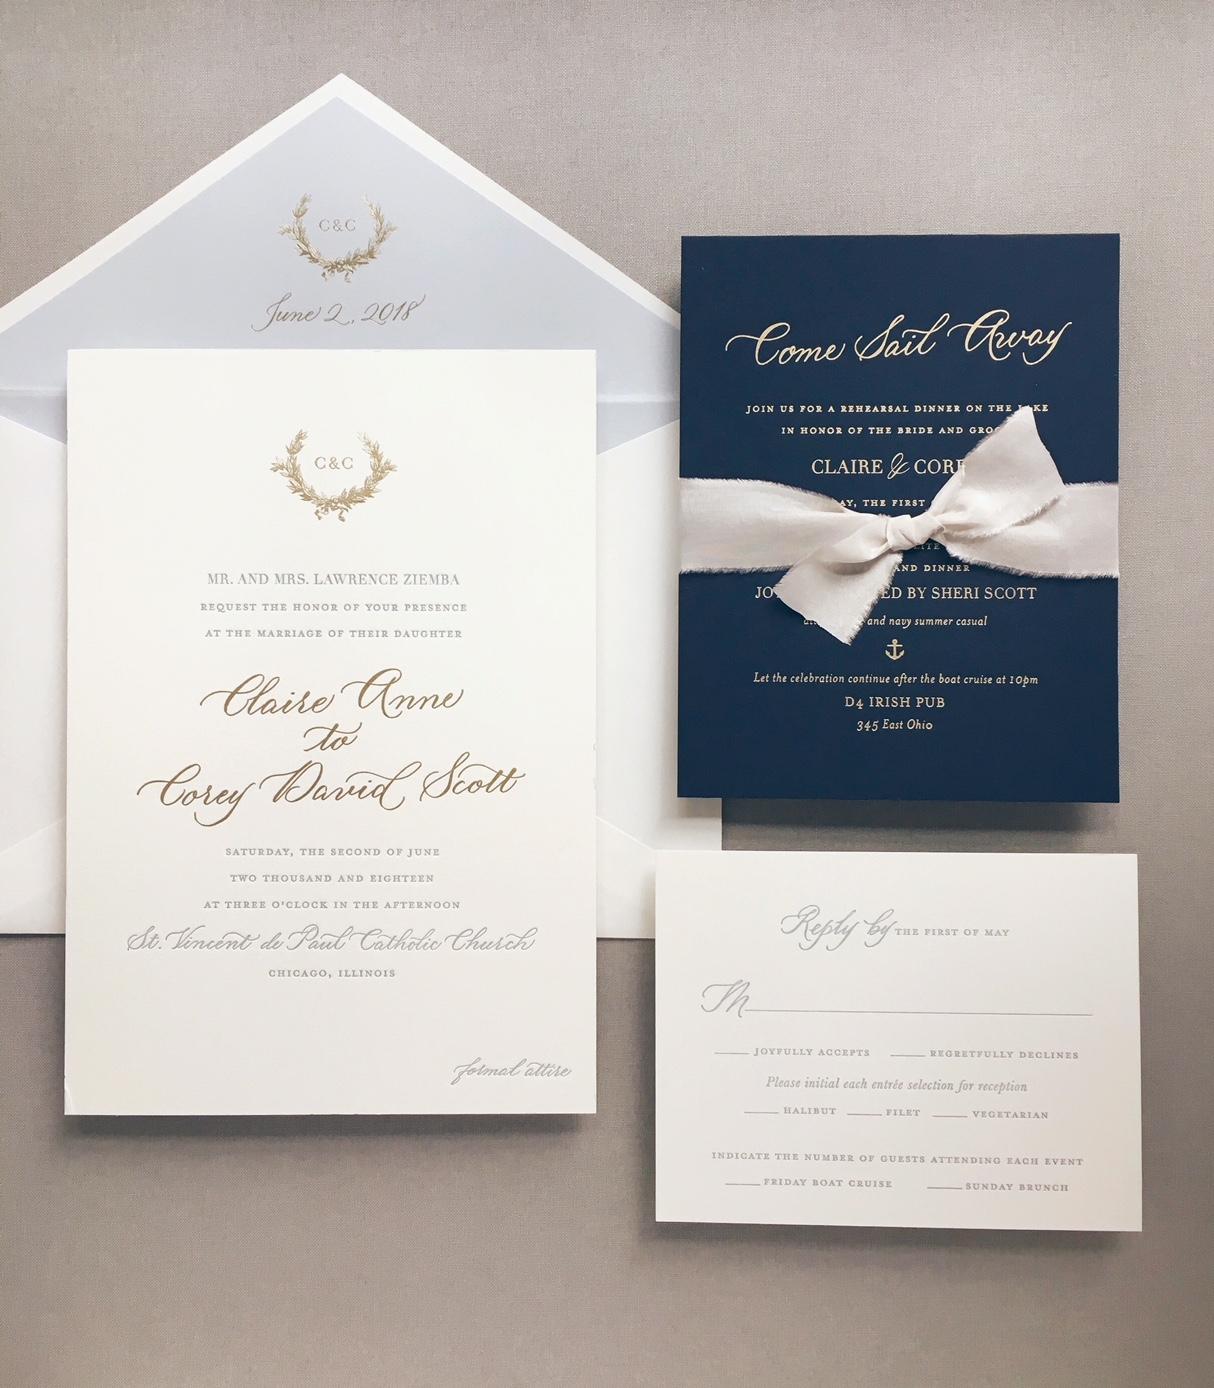 Suite Design: Emily Bailey  Spot Calligraphy: Joi Hunt